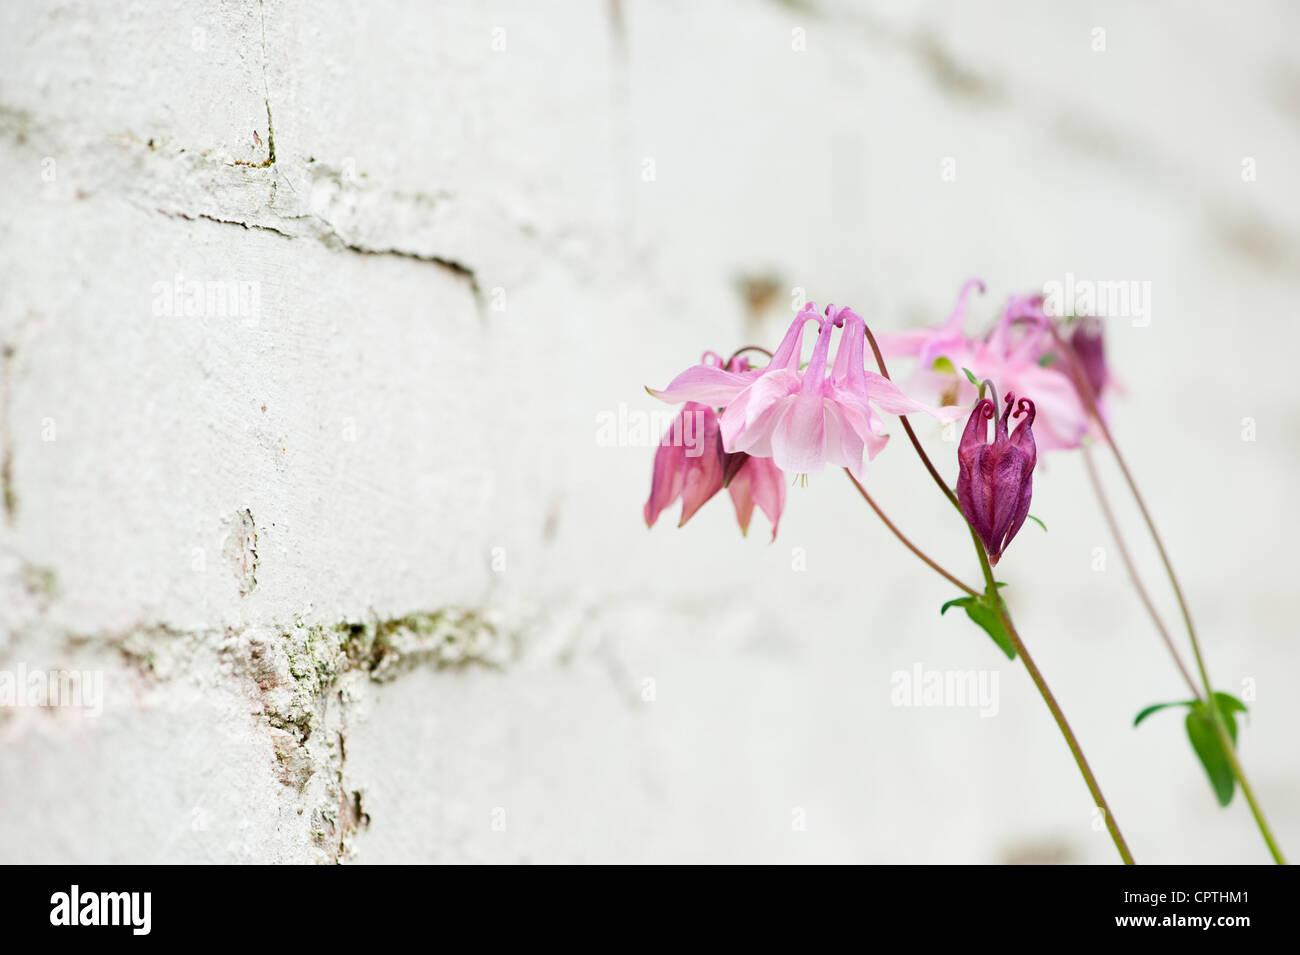 Aquilegia vulgaris rose fleur contre un mur du jardin peint en blanc Photo Stock